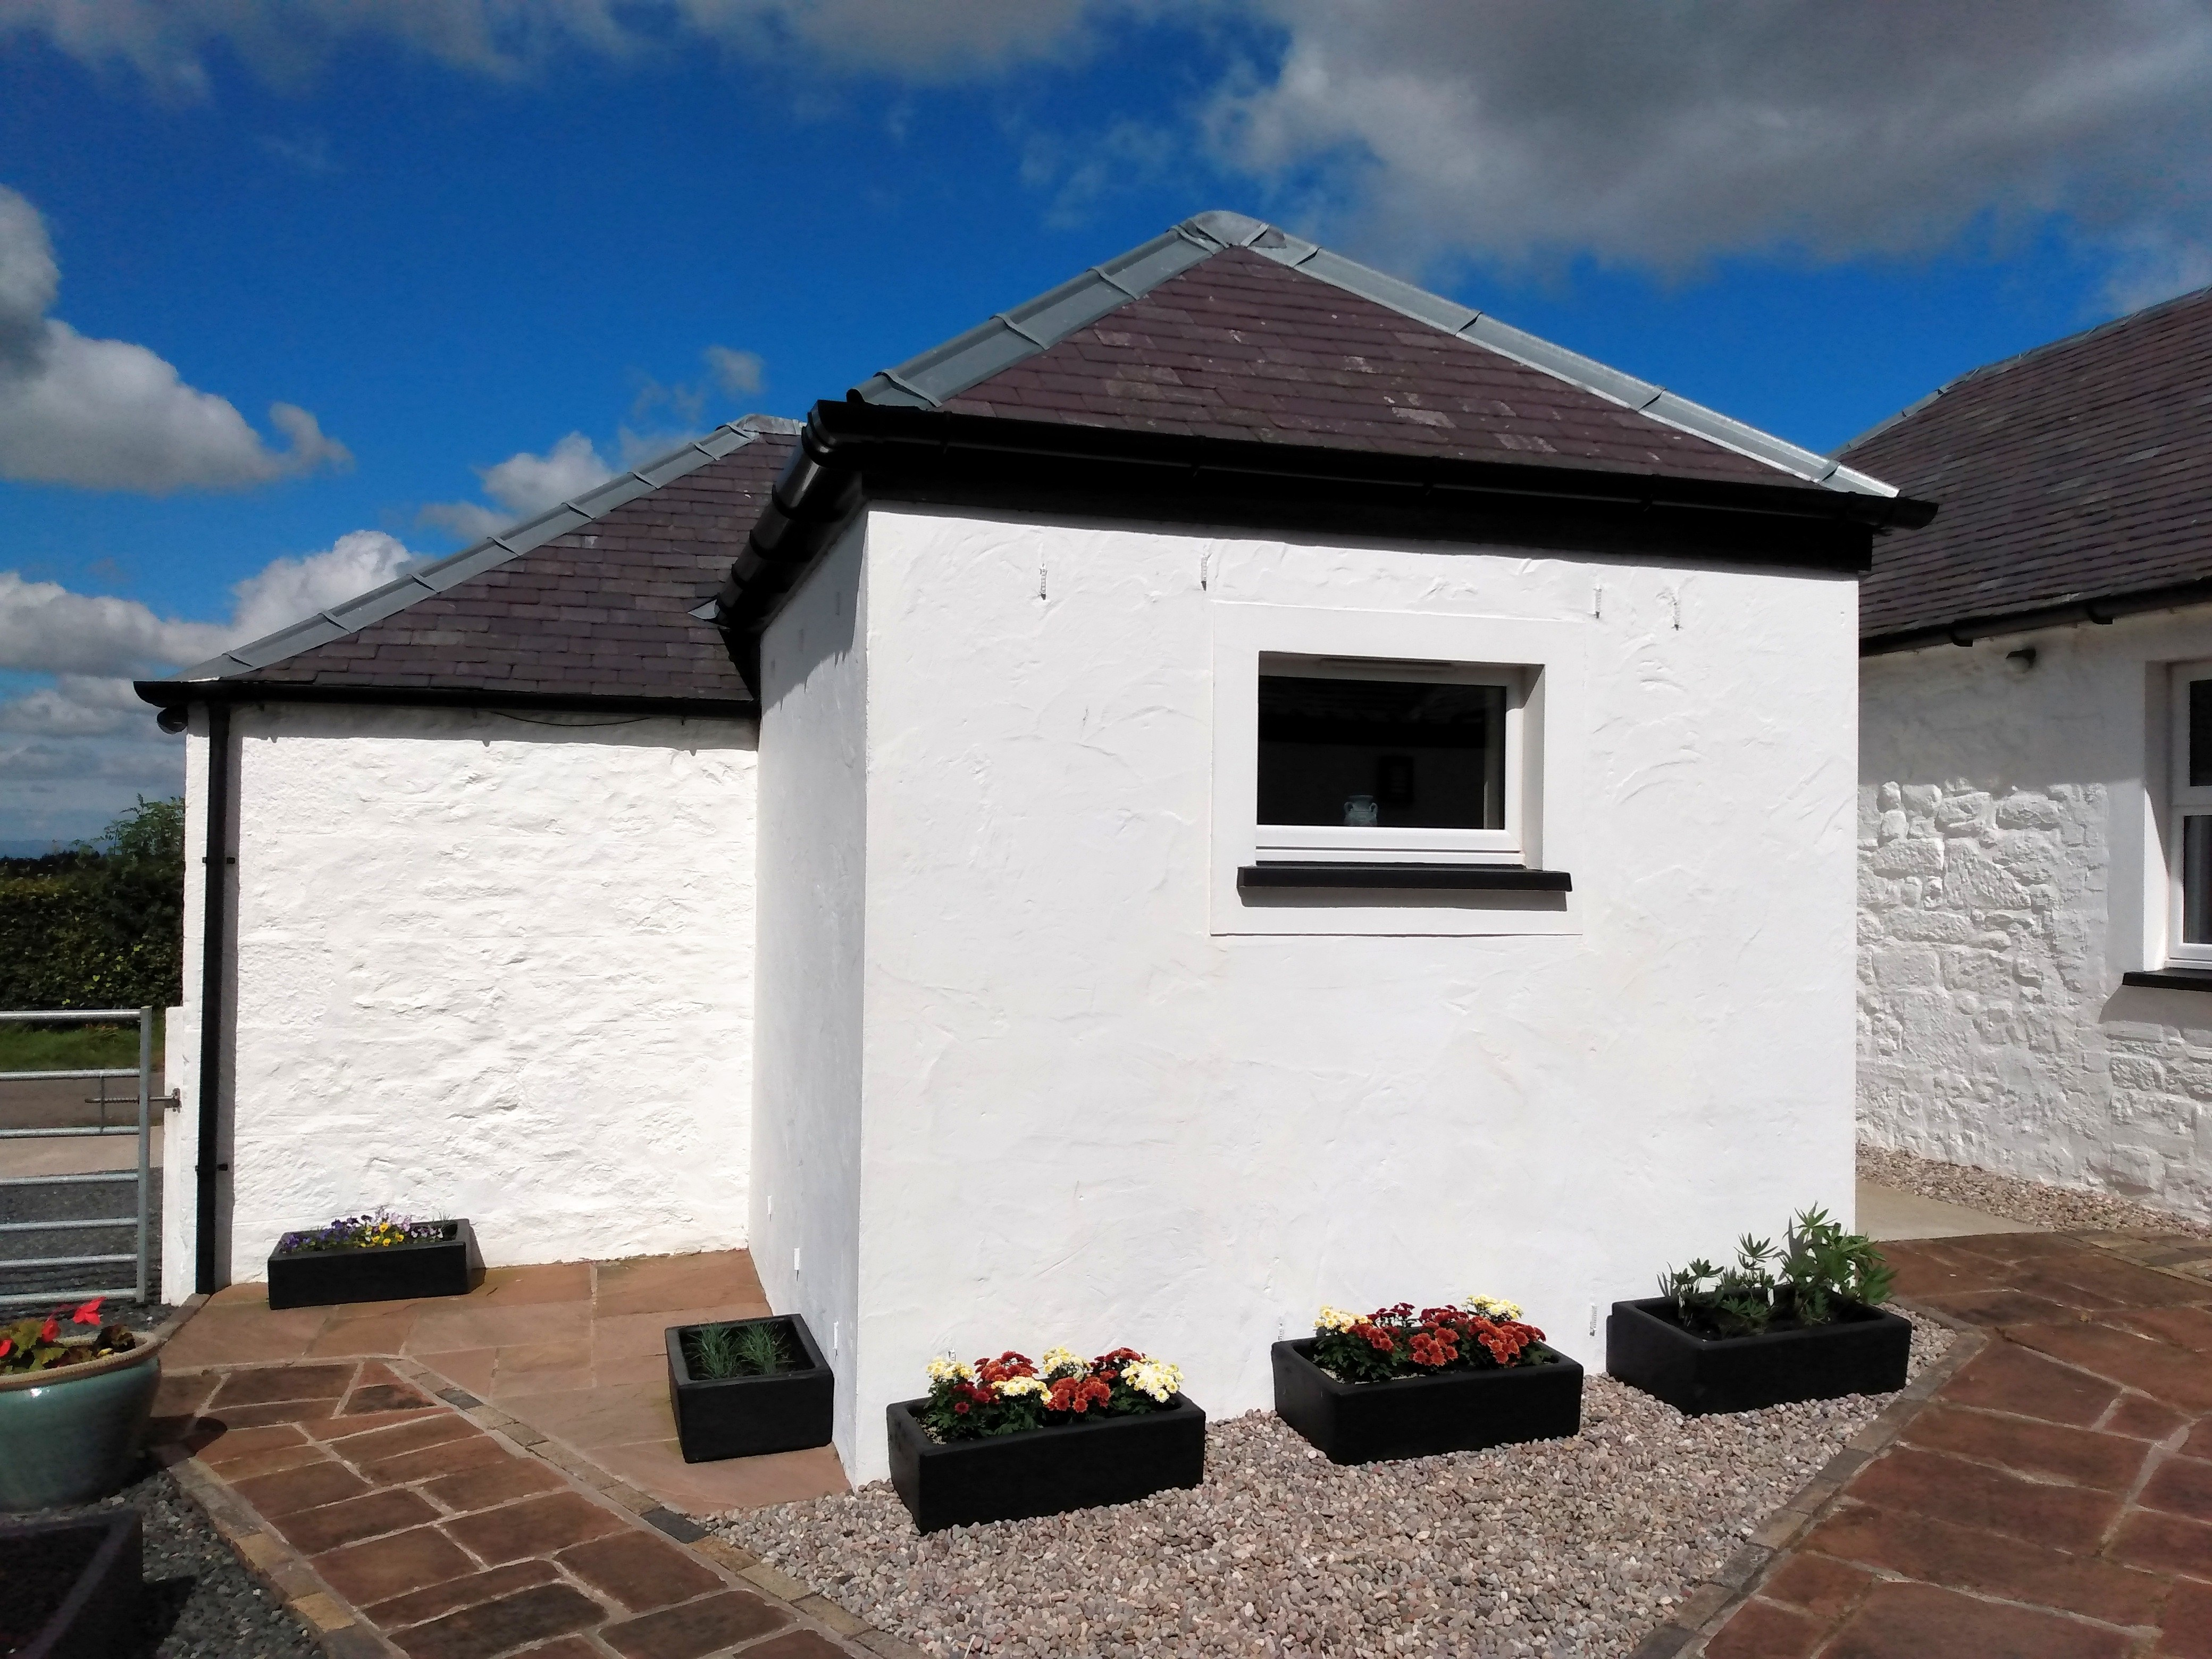 Darnhay Milkhouse7